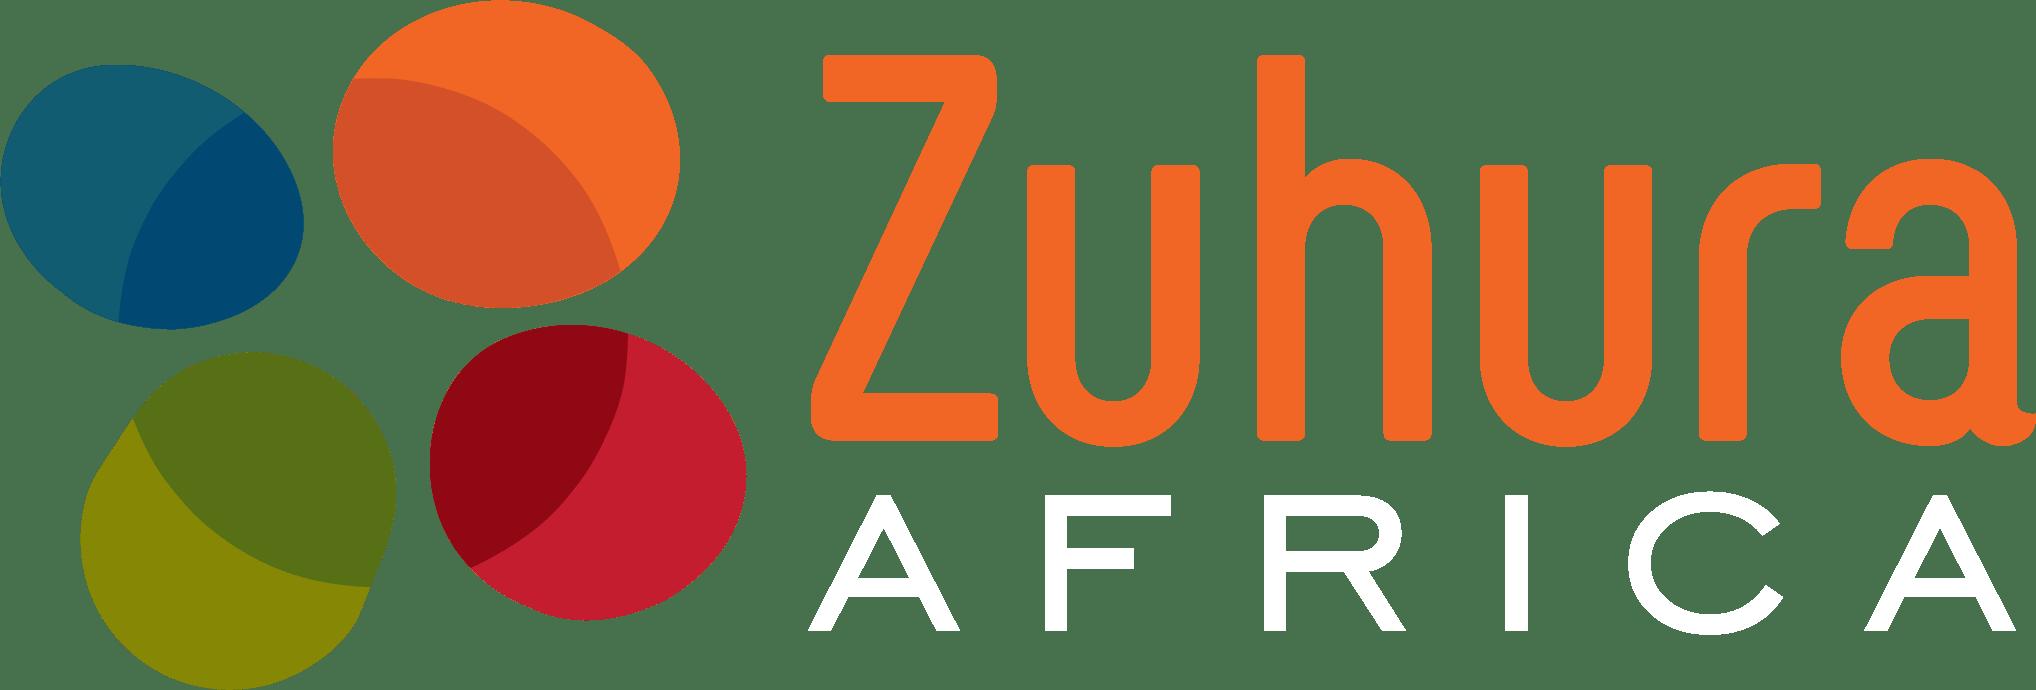 Zuhura Africa